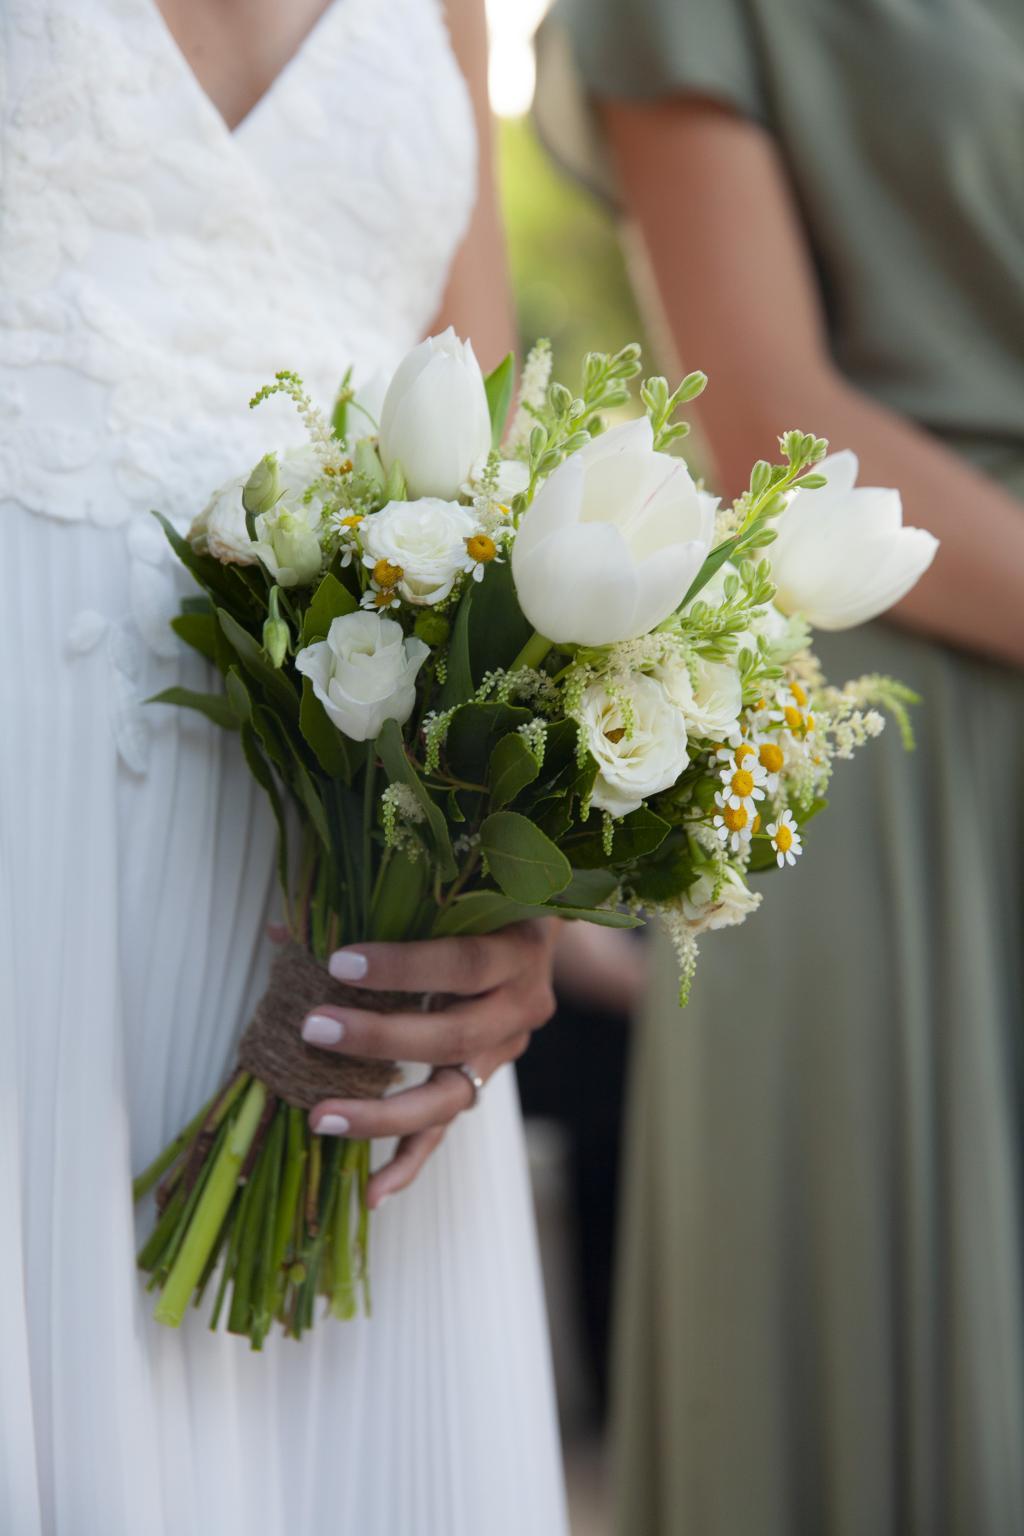 I&M Sinterina wedding - Image 5